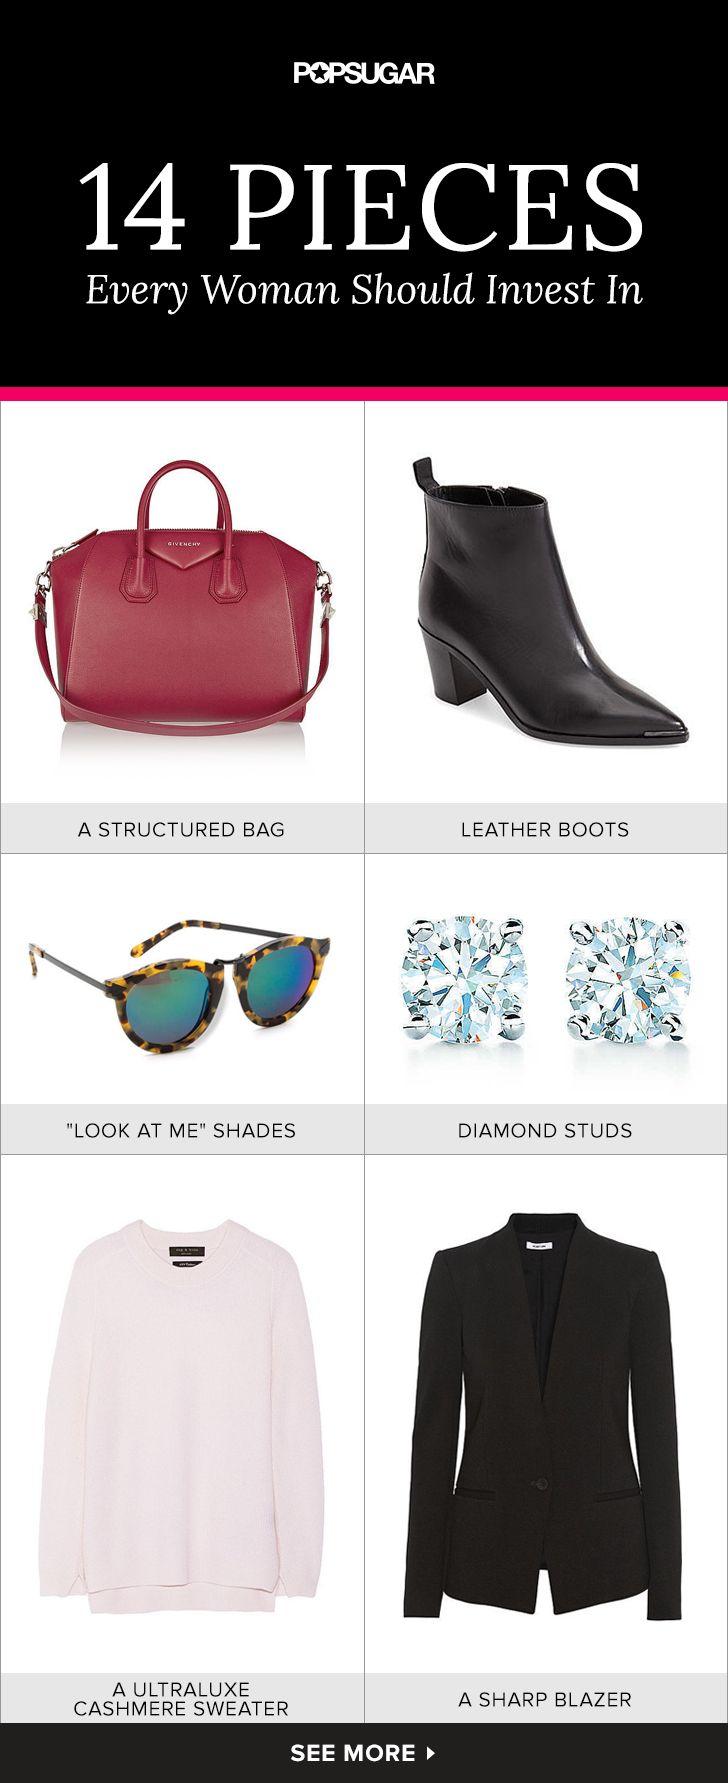 100 best images about Wardrobe Essentials on Pinterest ...